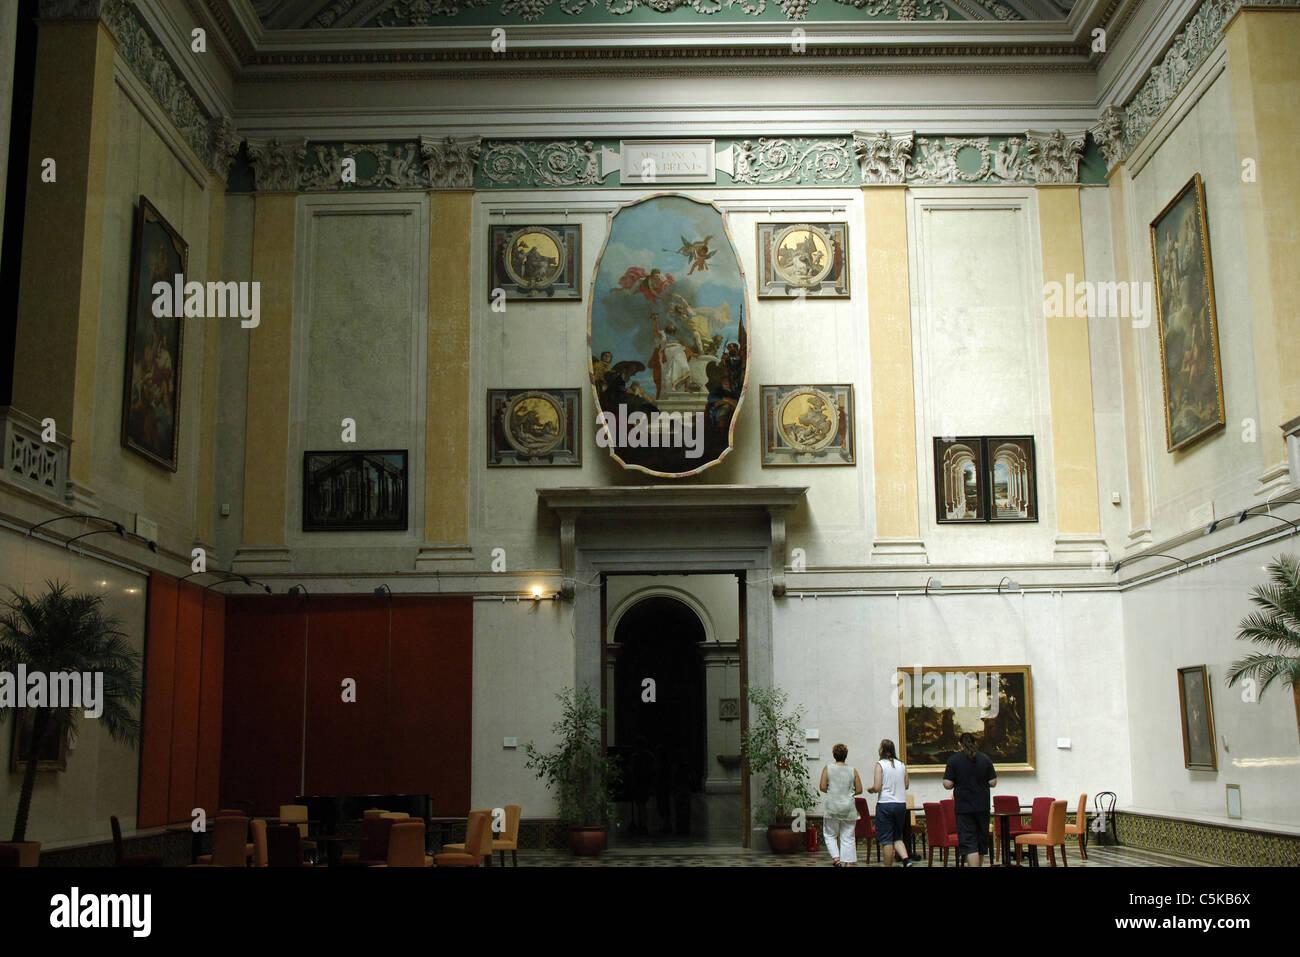 Museum of Fine Arts. Interior. Budapest. Hungary. - Stock Image